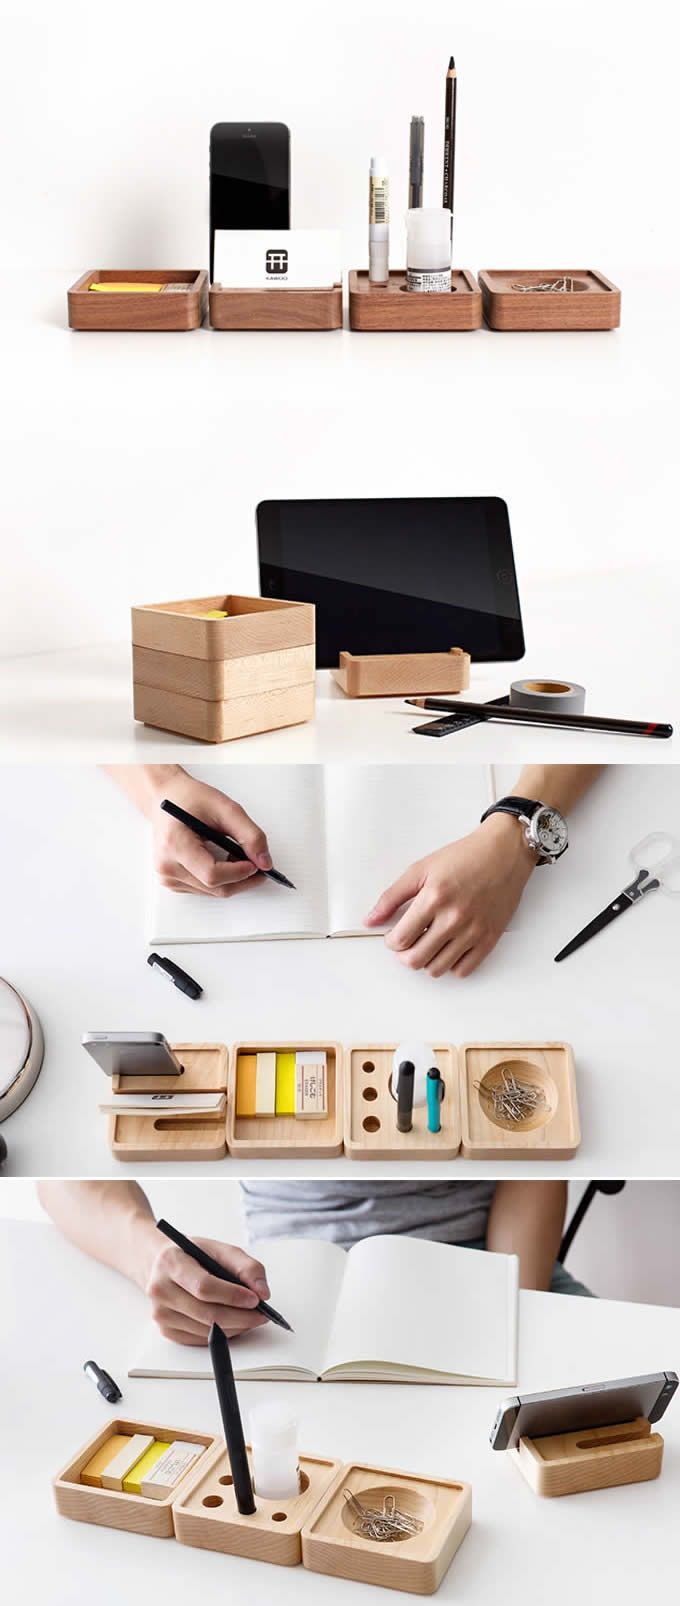 f649d34b14 Pen Stand Holder Wooden Smart Phone Dock Storage Desktop Accessories Set